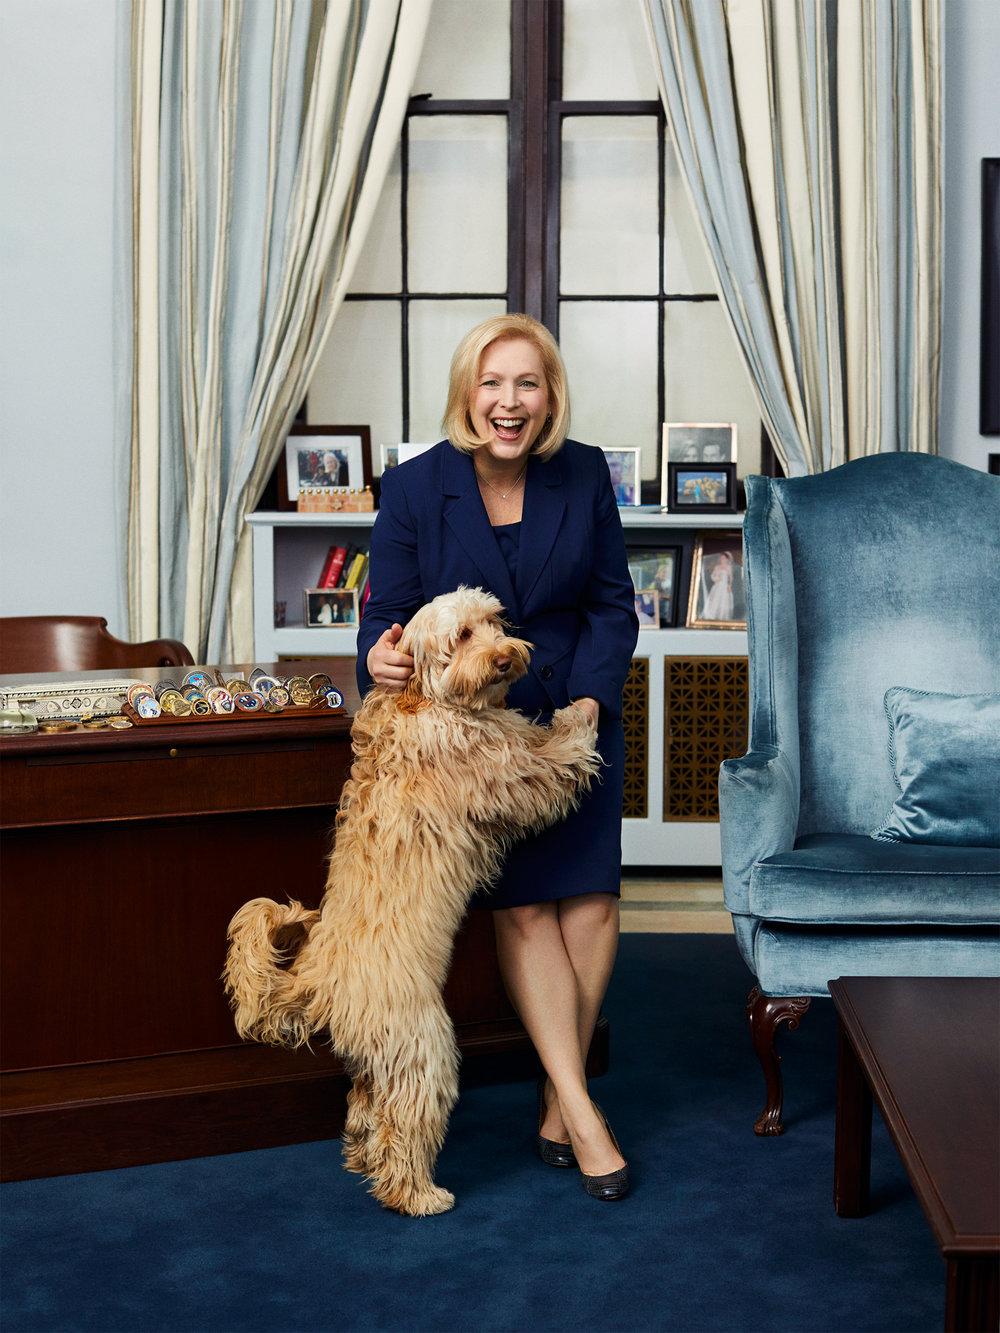 Senator Kirsten Gillibrand/Glamour April 2018